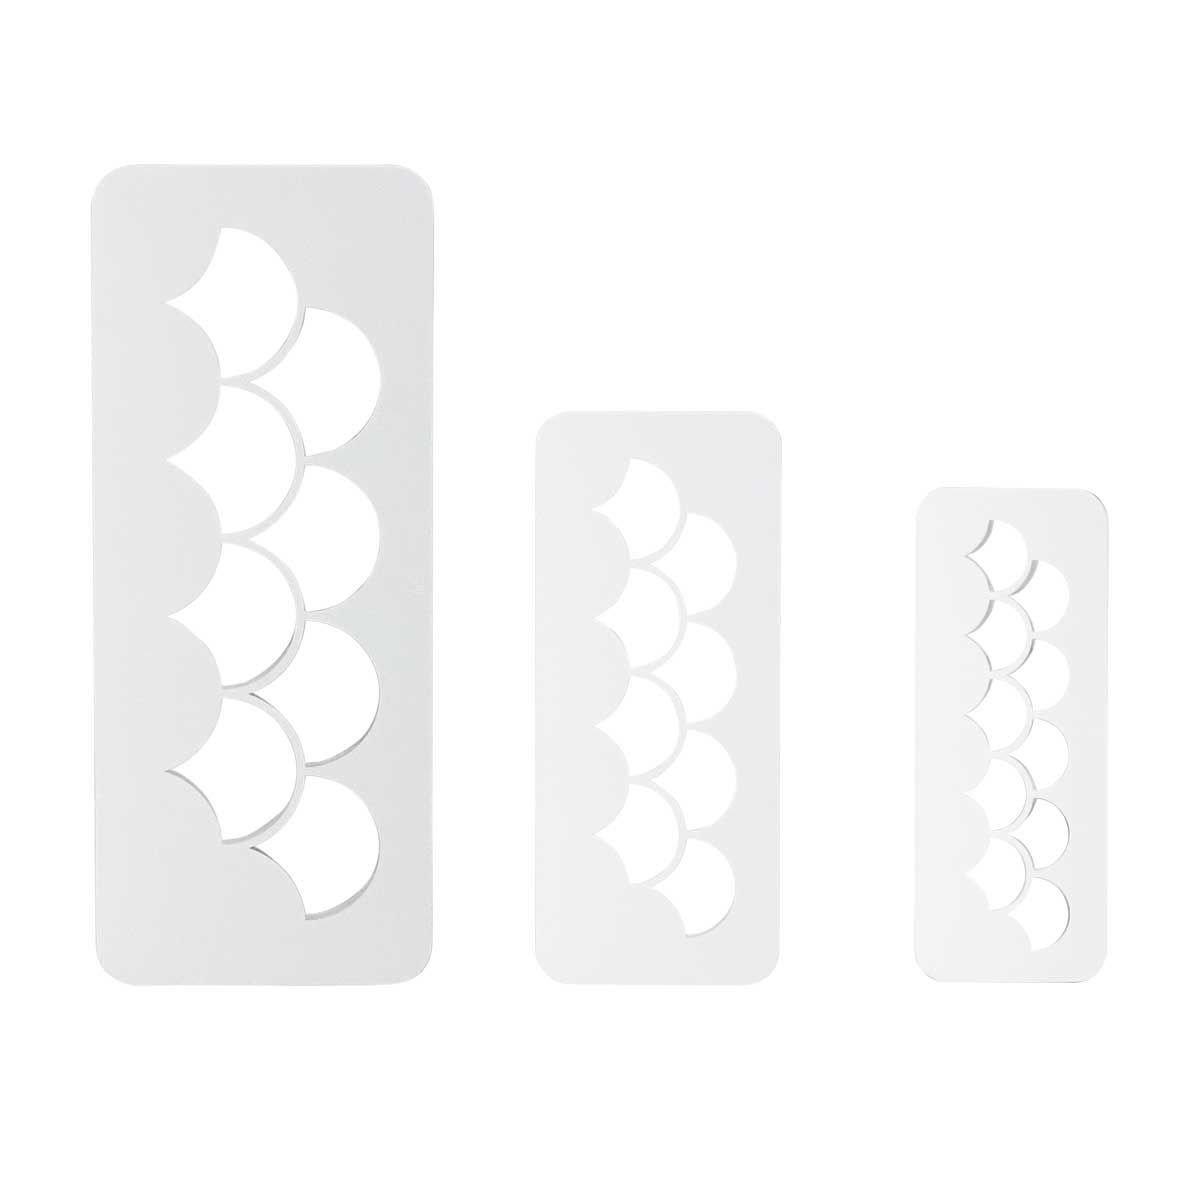 PME Geometric Multicutters -Set of 3 -FISH/MERMAID SCALES -Σετ 3τεμ Πολλαπλό Κουπ πατ Λέπια